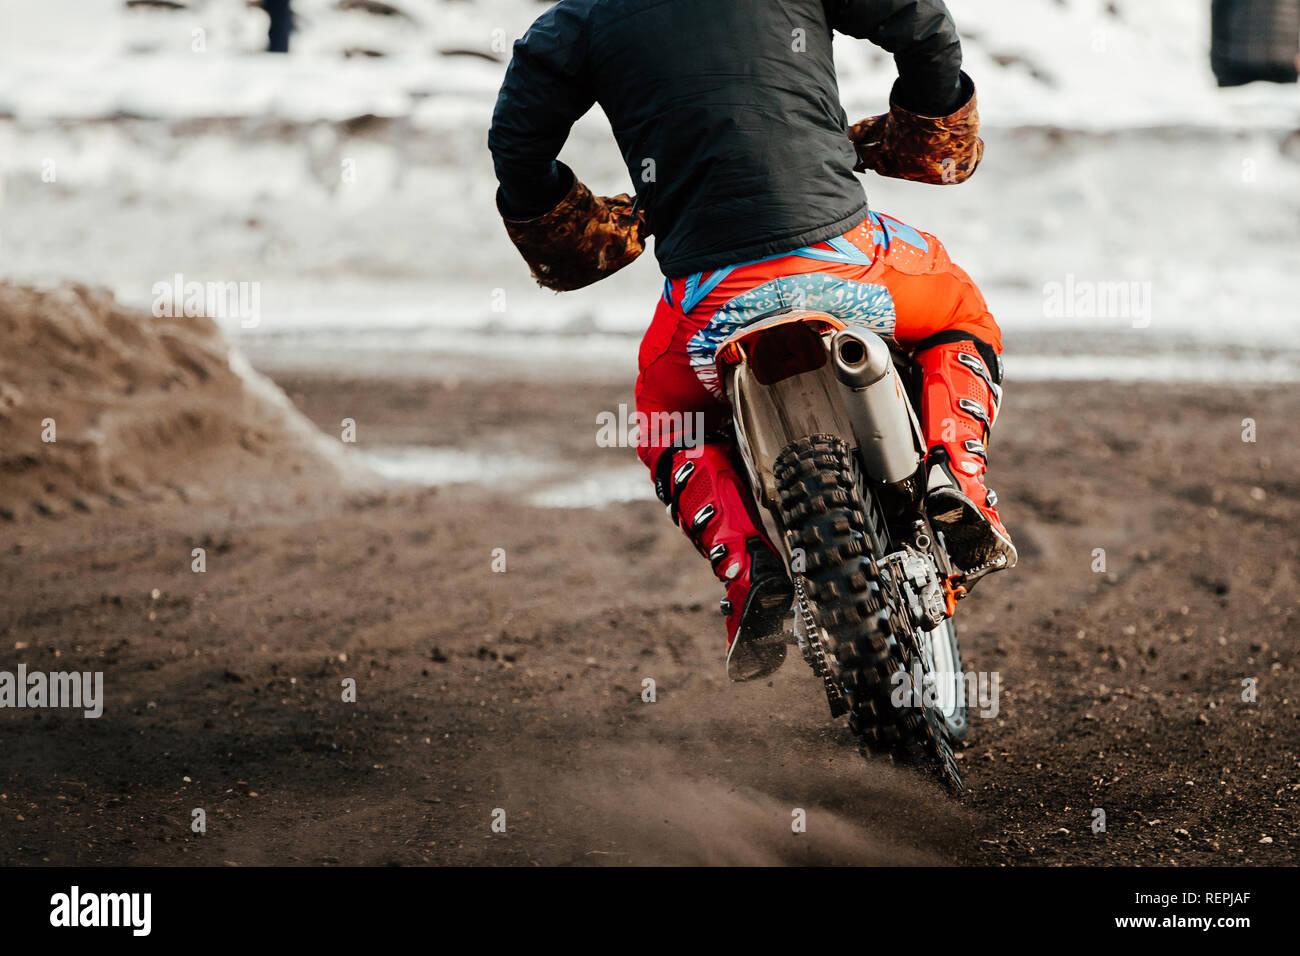 racer enduro motorcycle riding on winter track Stock Photo